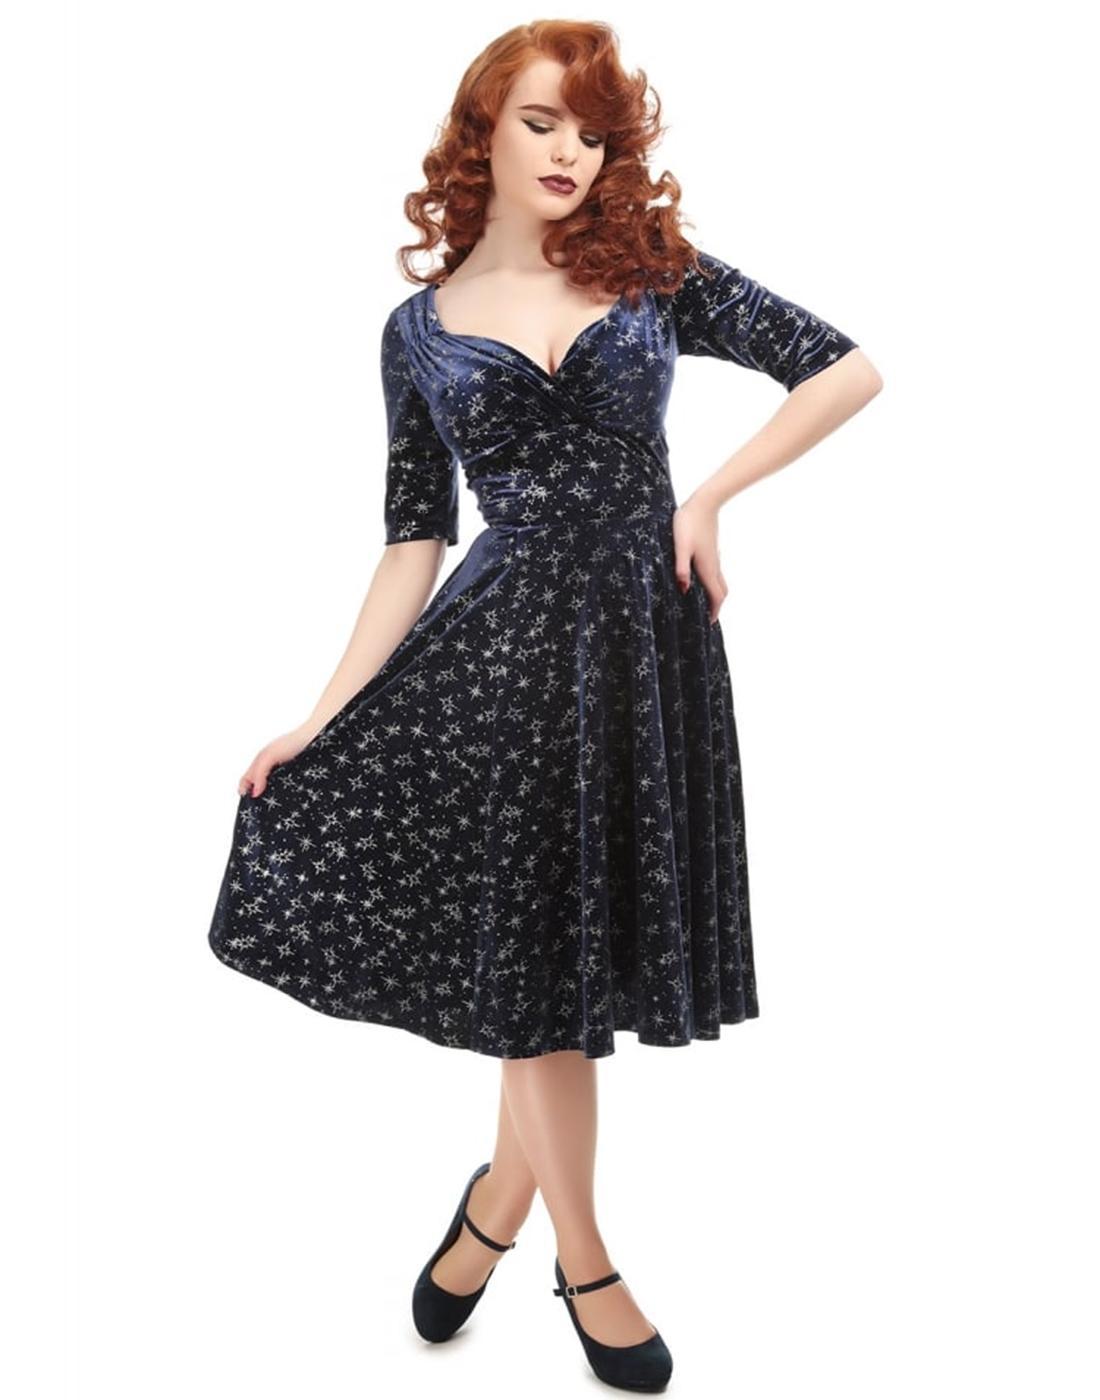 Trixie Velvet COLLECTIF Retro Vintage Doll Dress